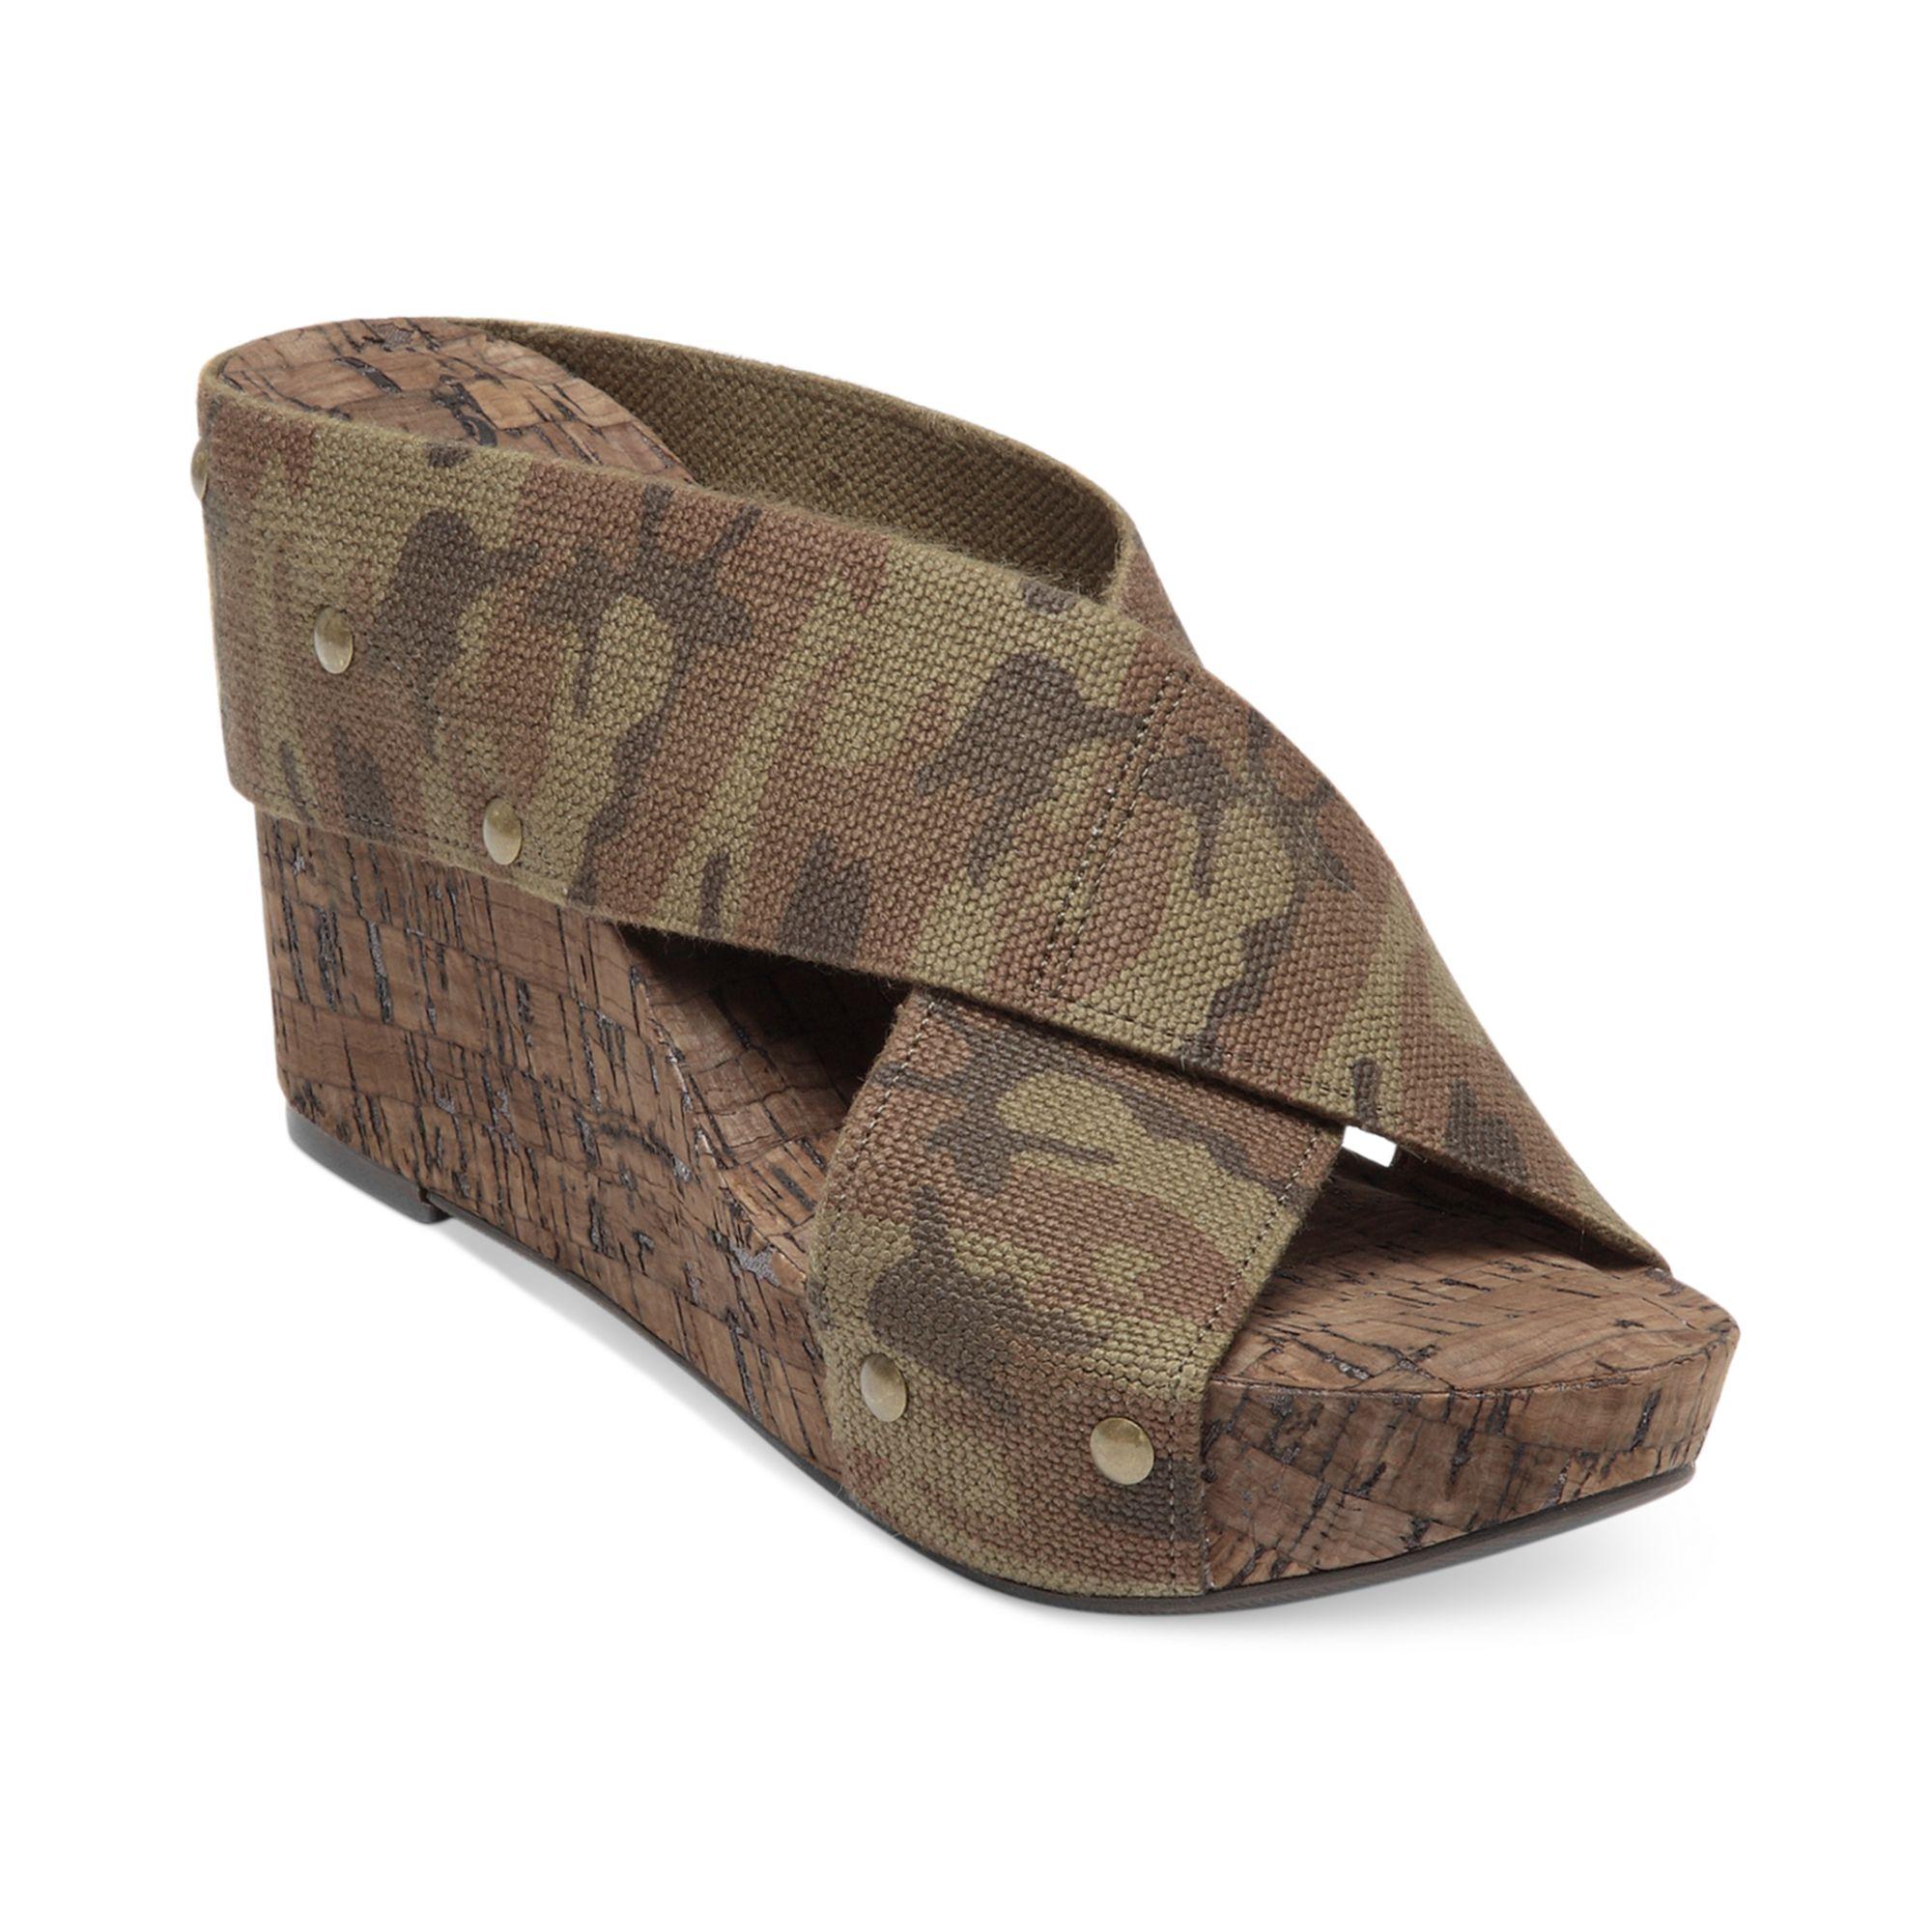 lucky brand miller2 wedge sandals in khaki camo lyst